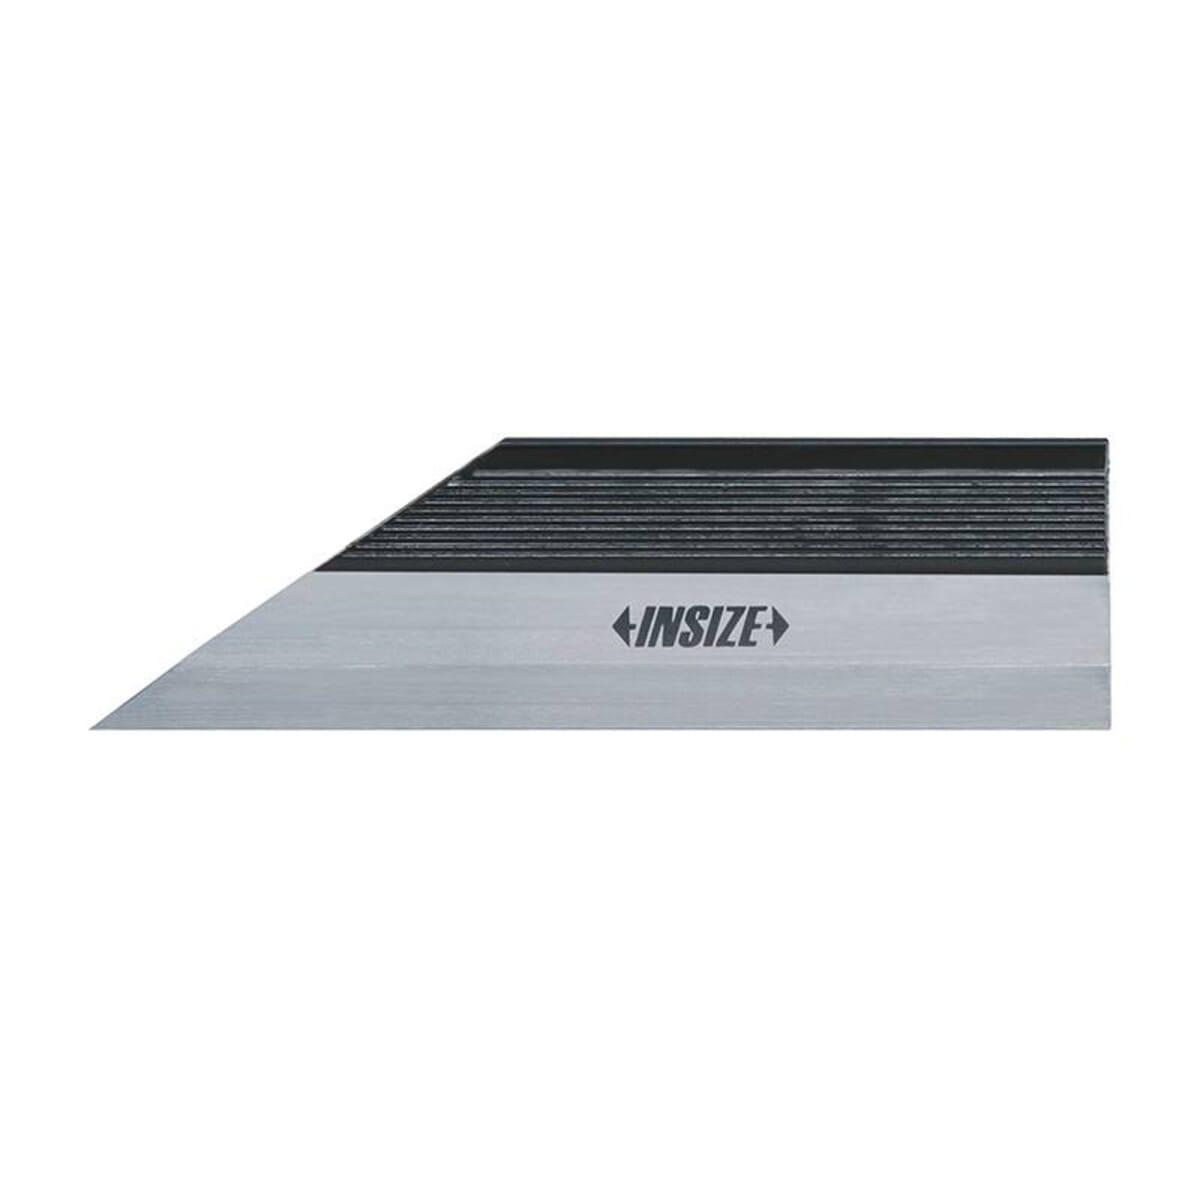 50mm [0.0022mm] Straight Edge Blade (Insize 4700)